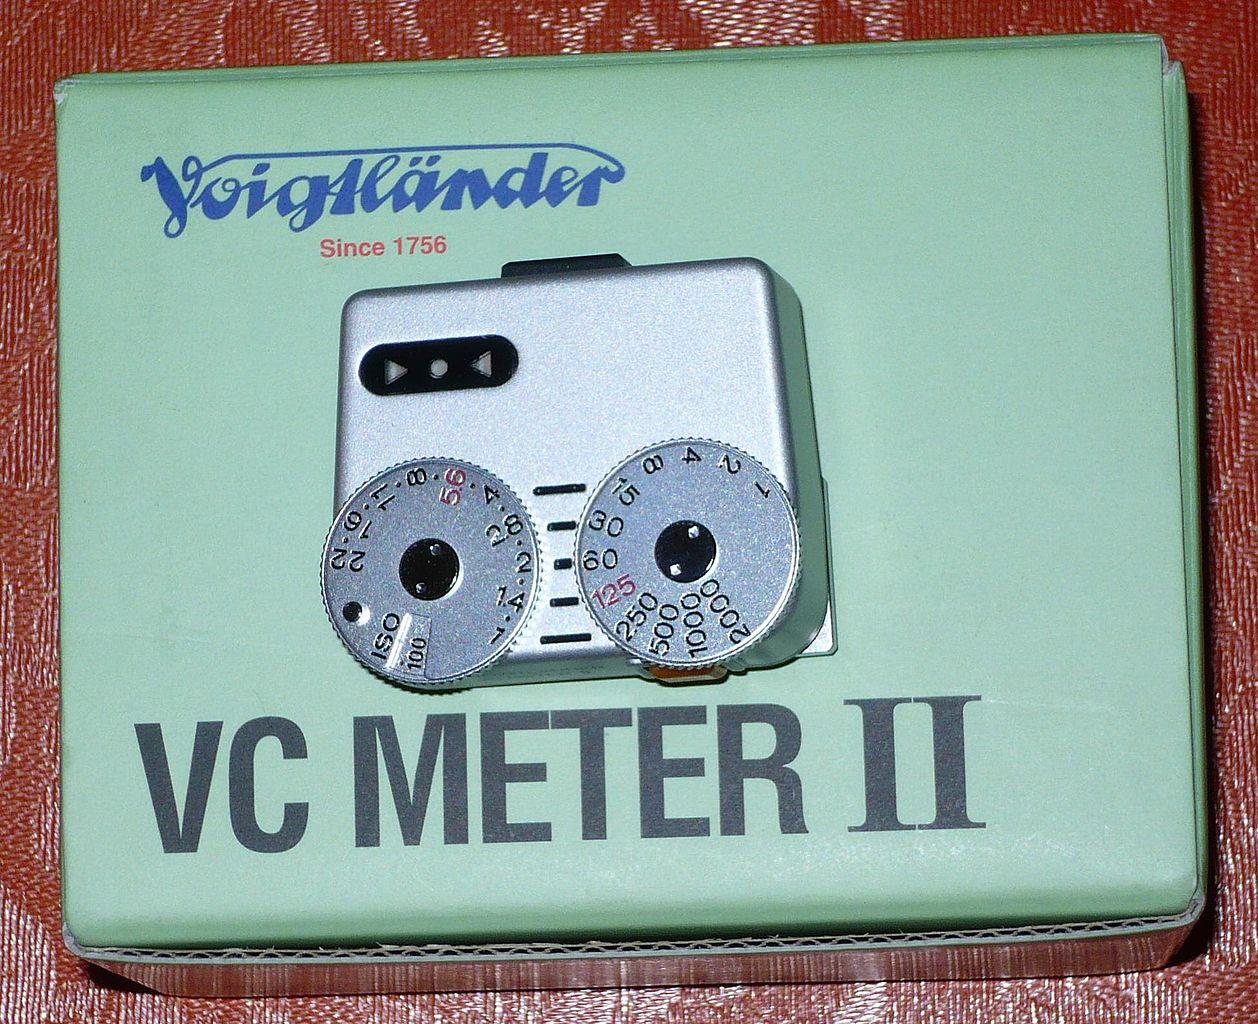 Voigtlander VC Meter II (Pic: Gisling/Wikimedia Commons)